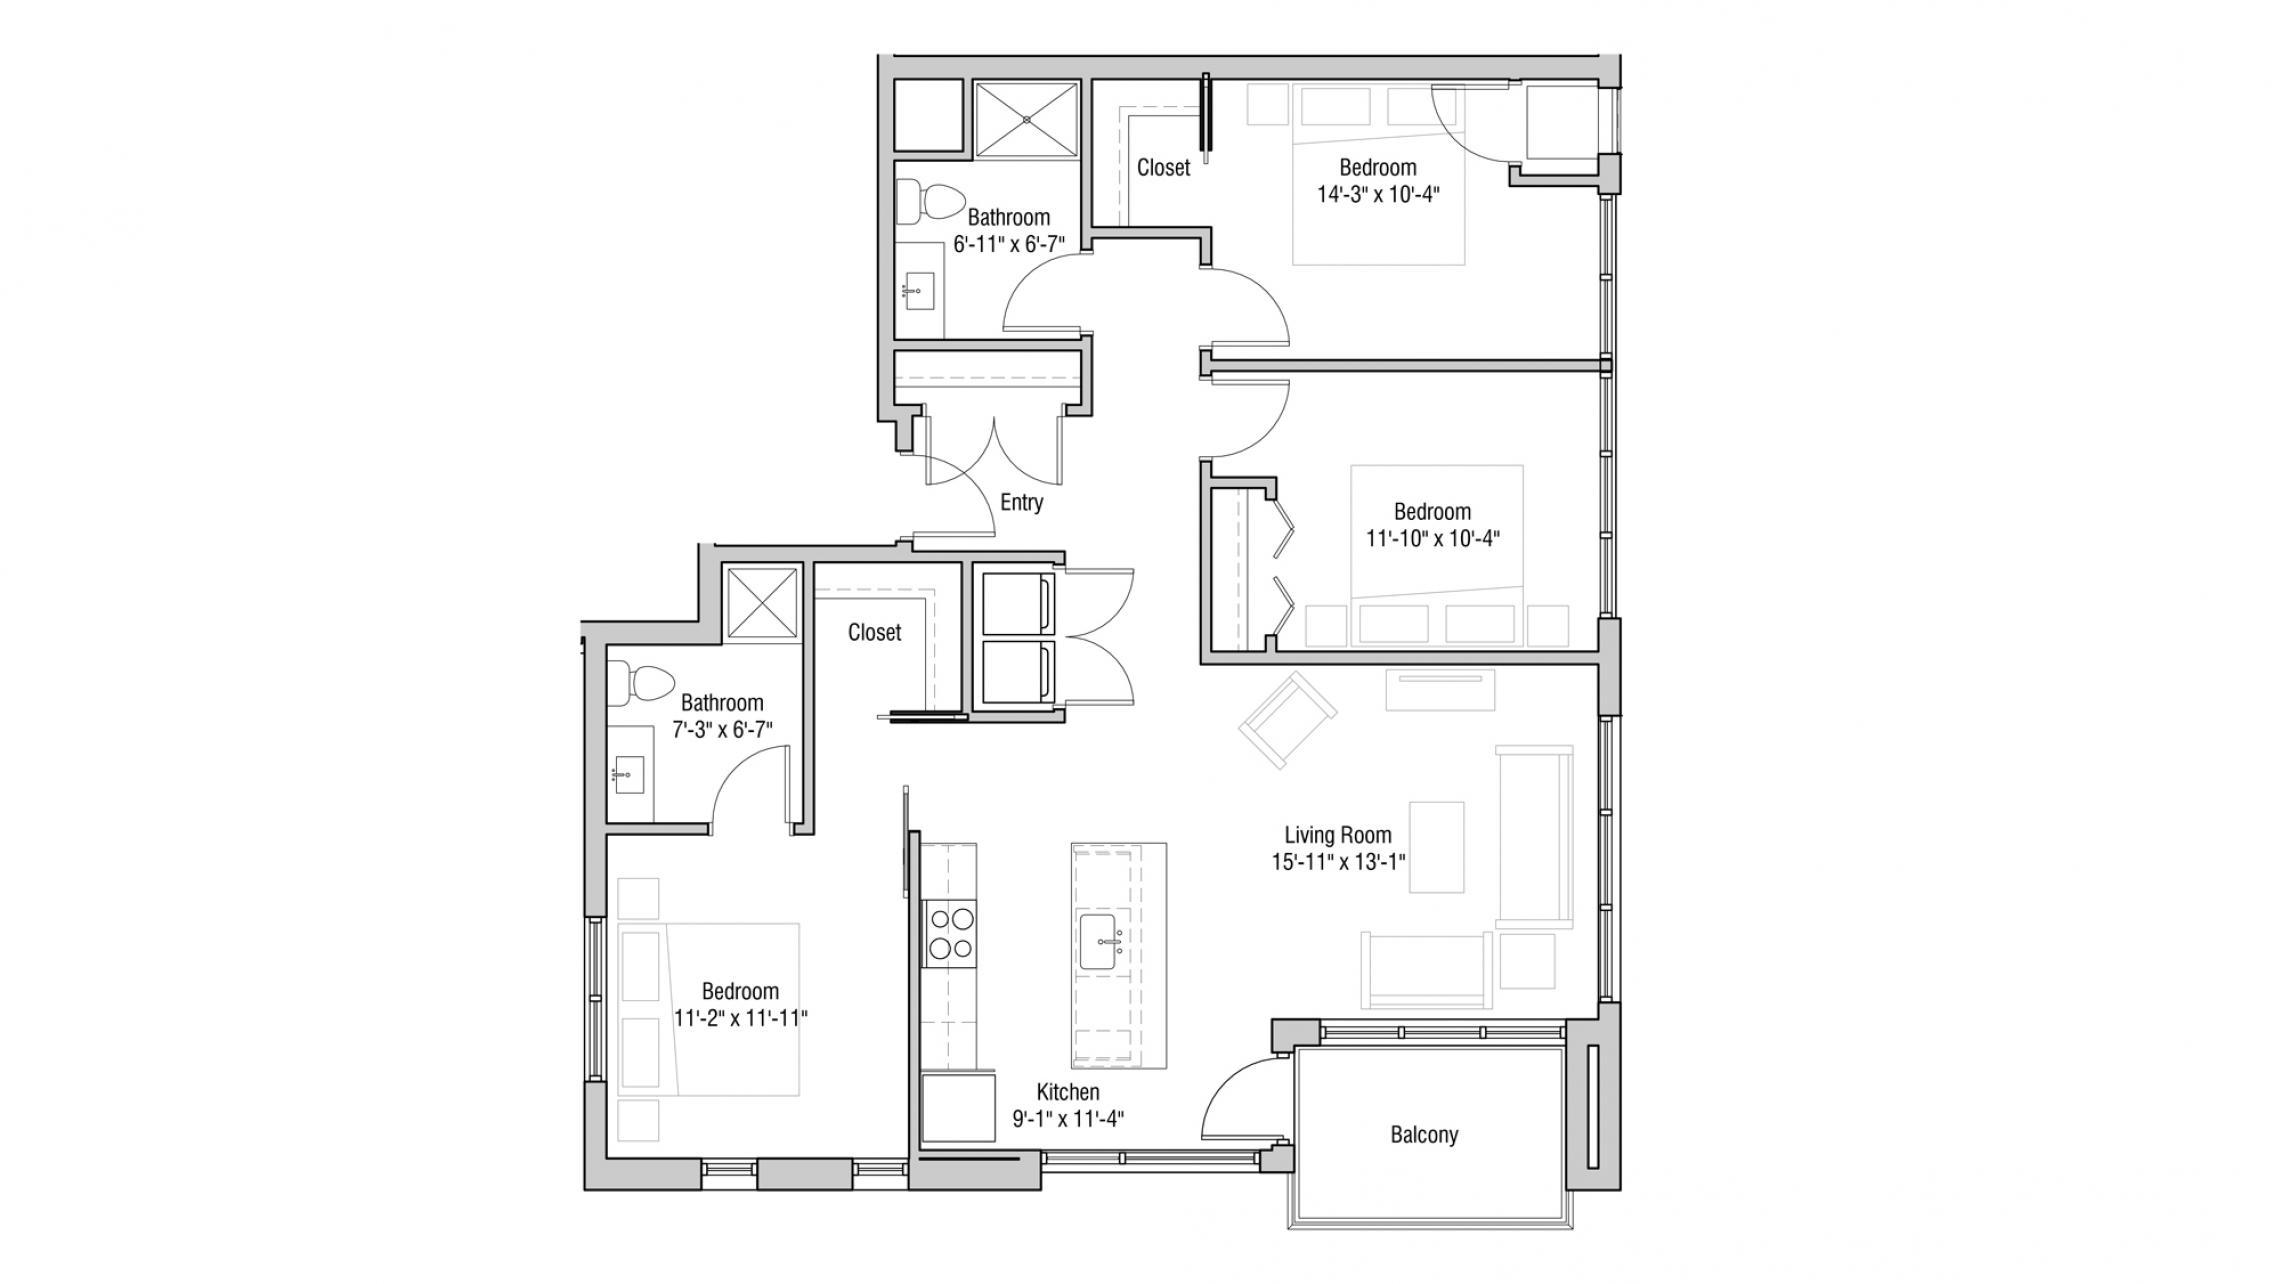 ULI Quarter Row 301 - Three Bedroom, Two Bathroom